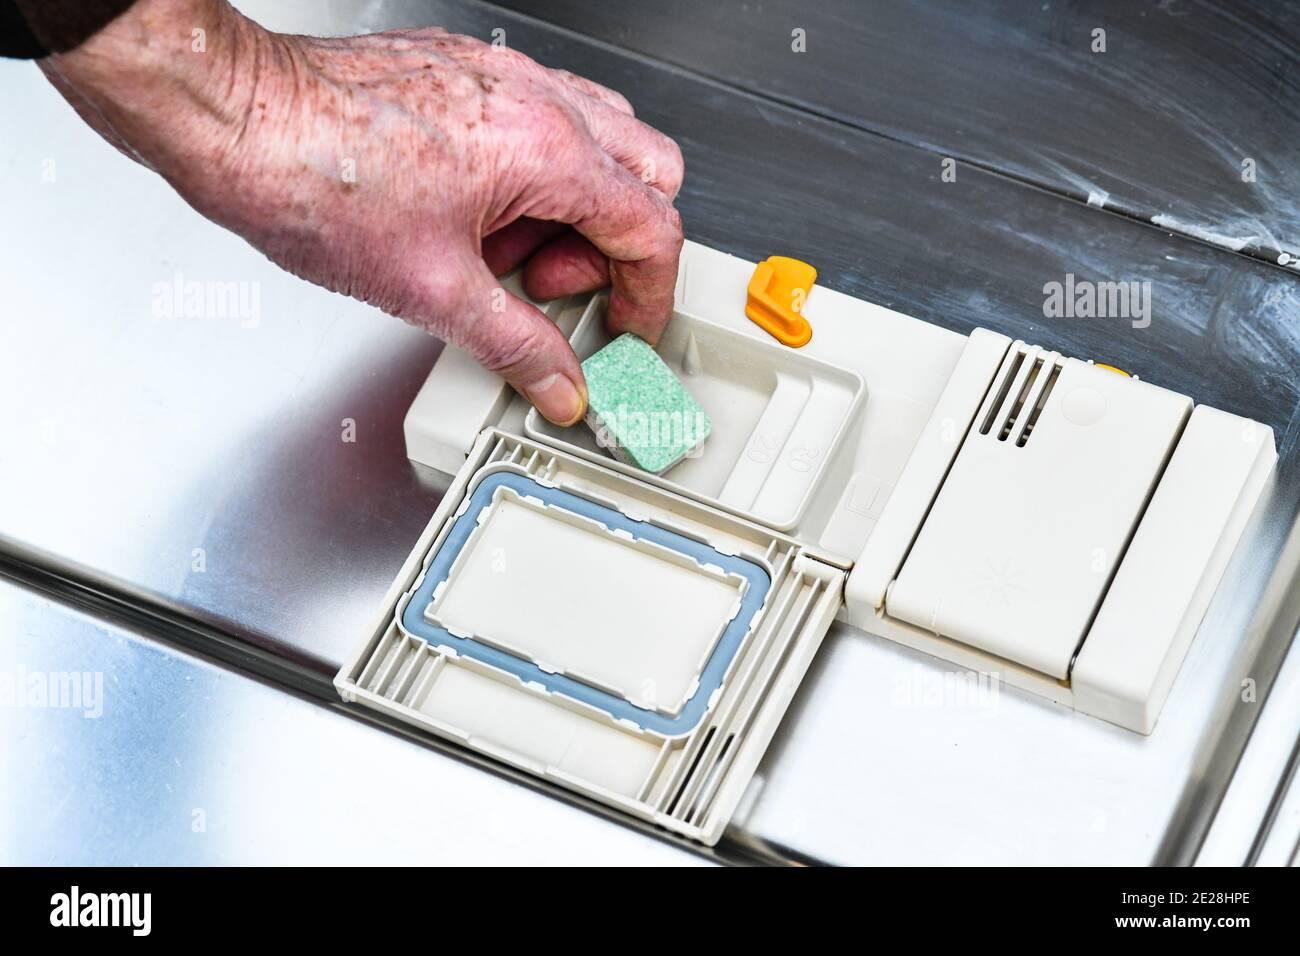 Tab, Geschirrspülmaschine Stock Photo